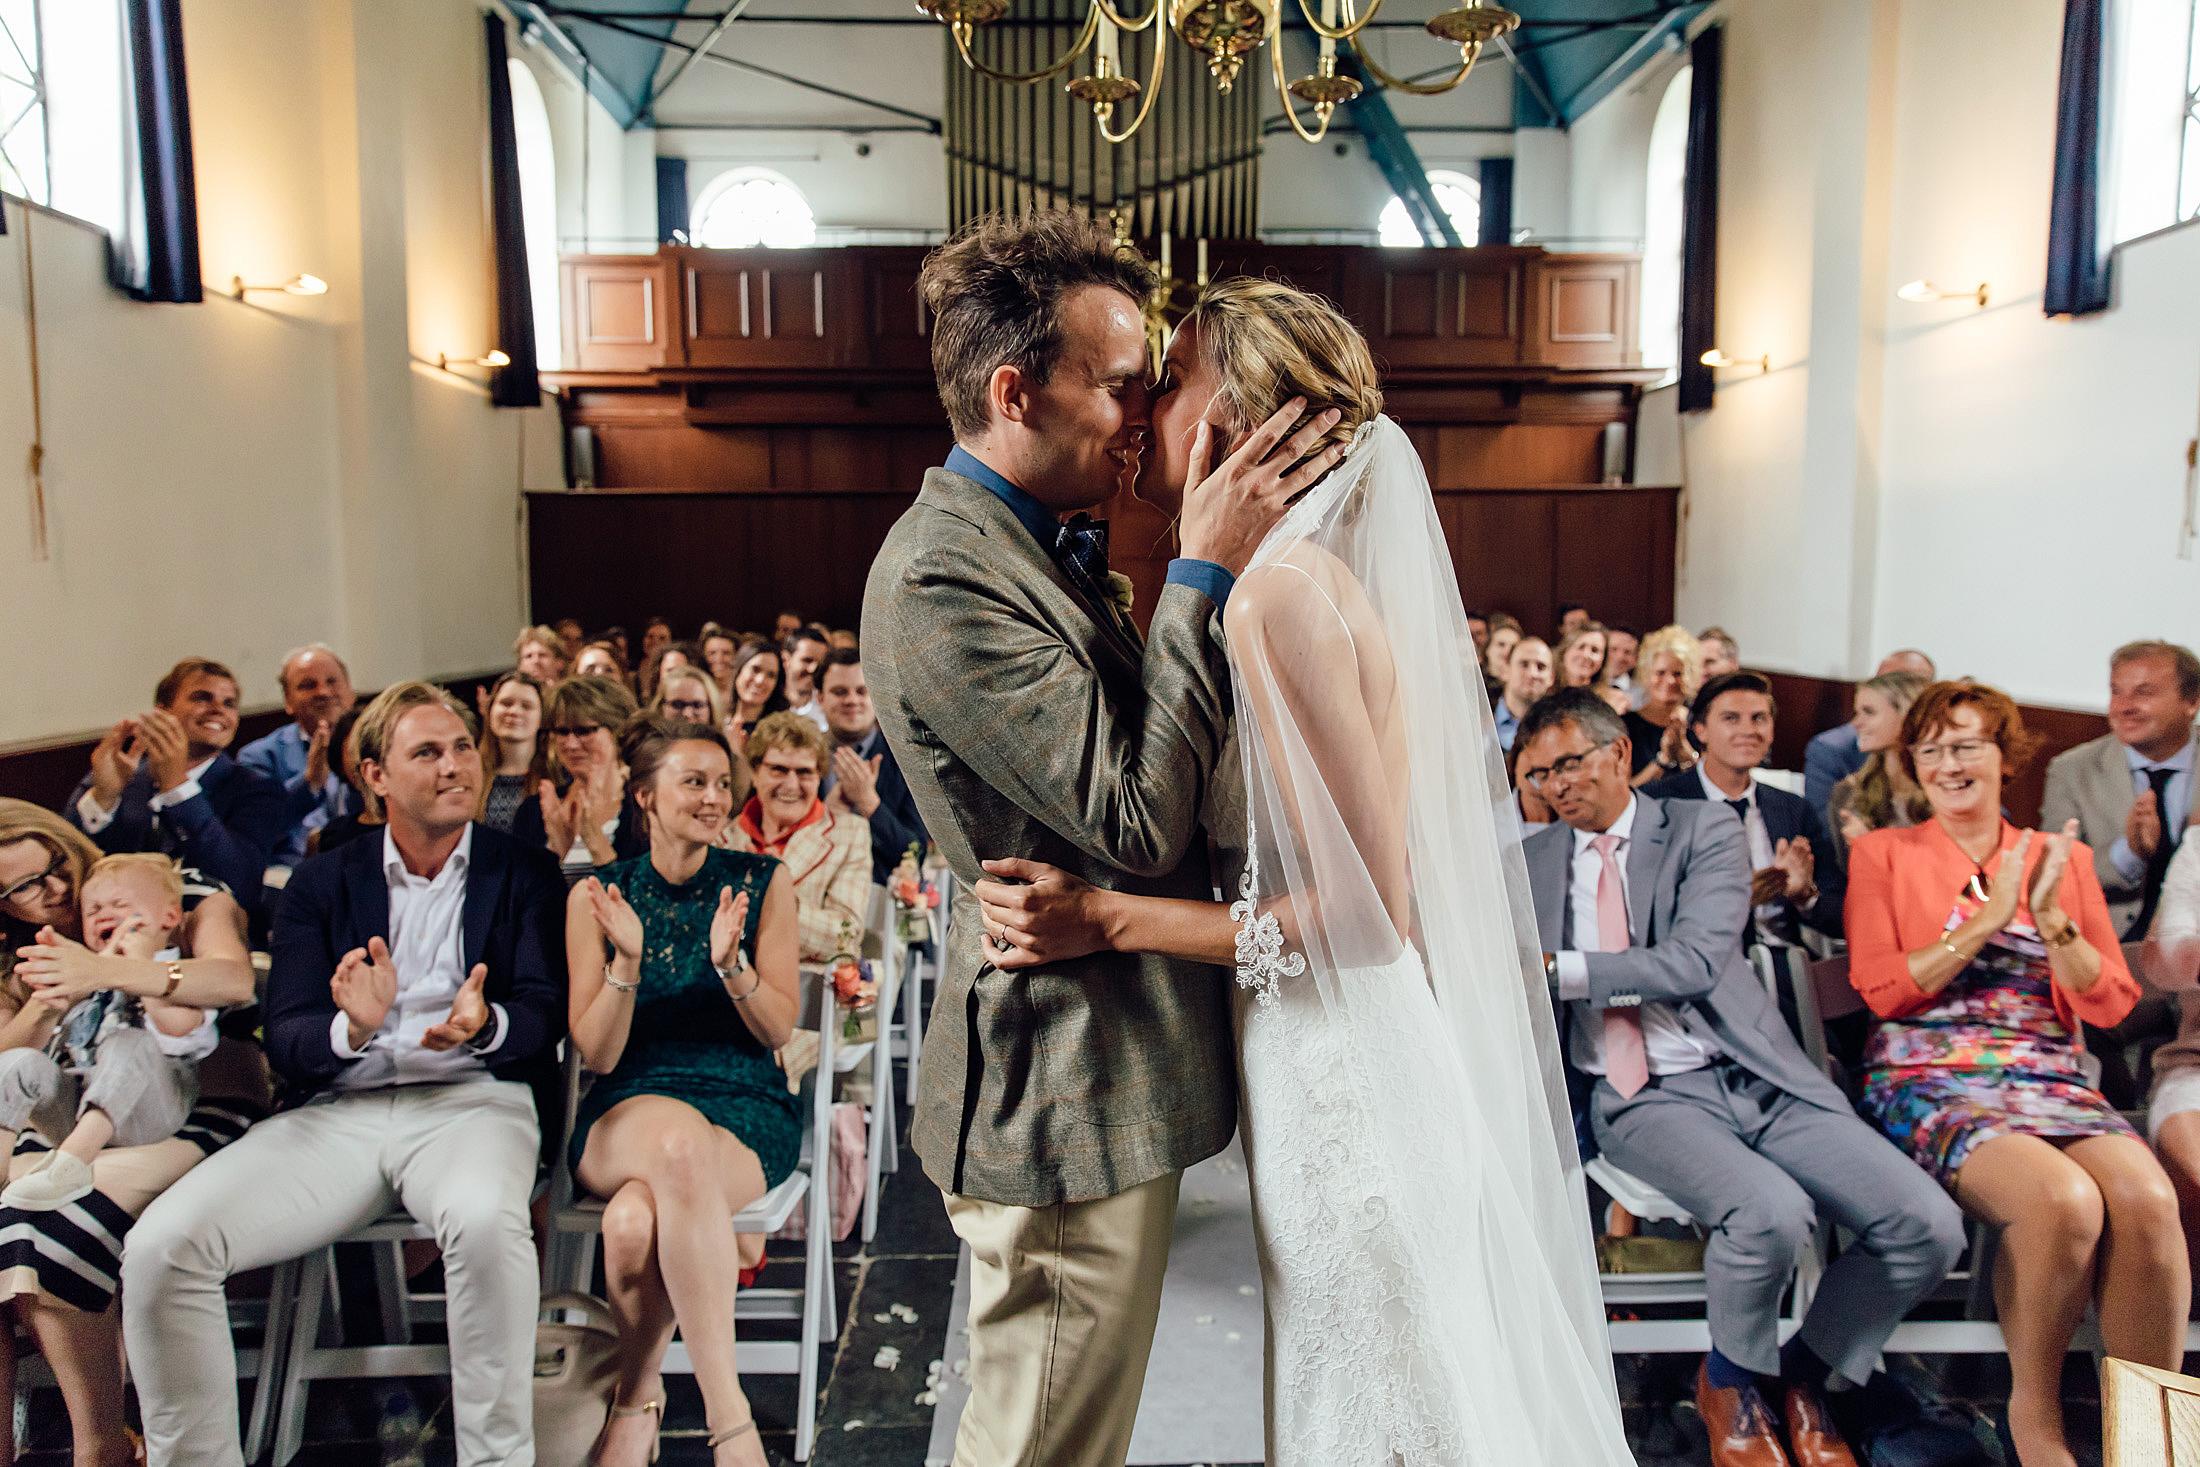 kus trouwceremonie